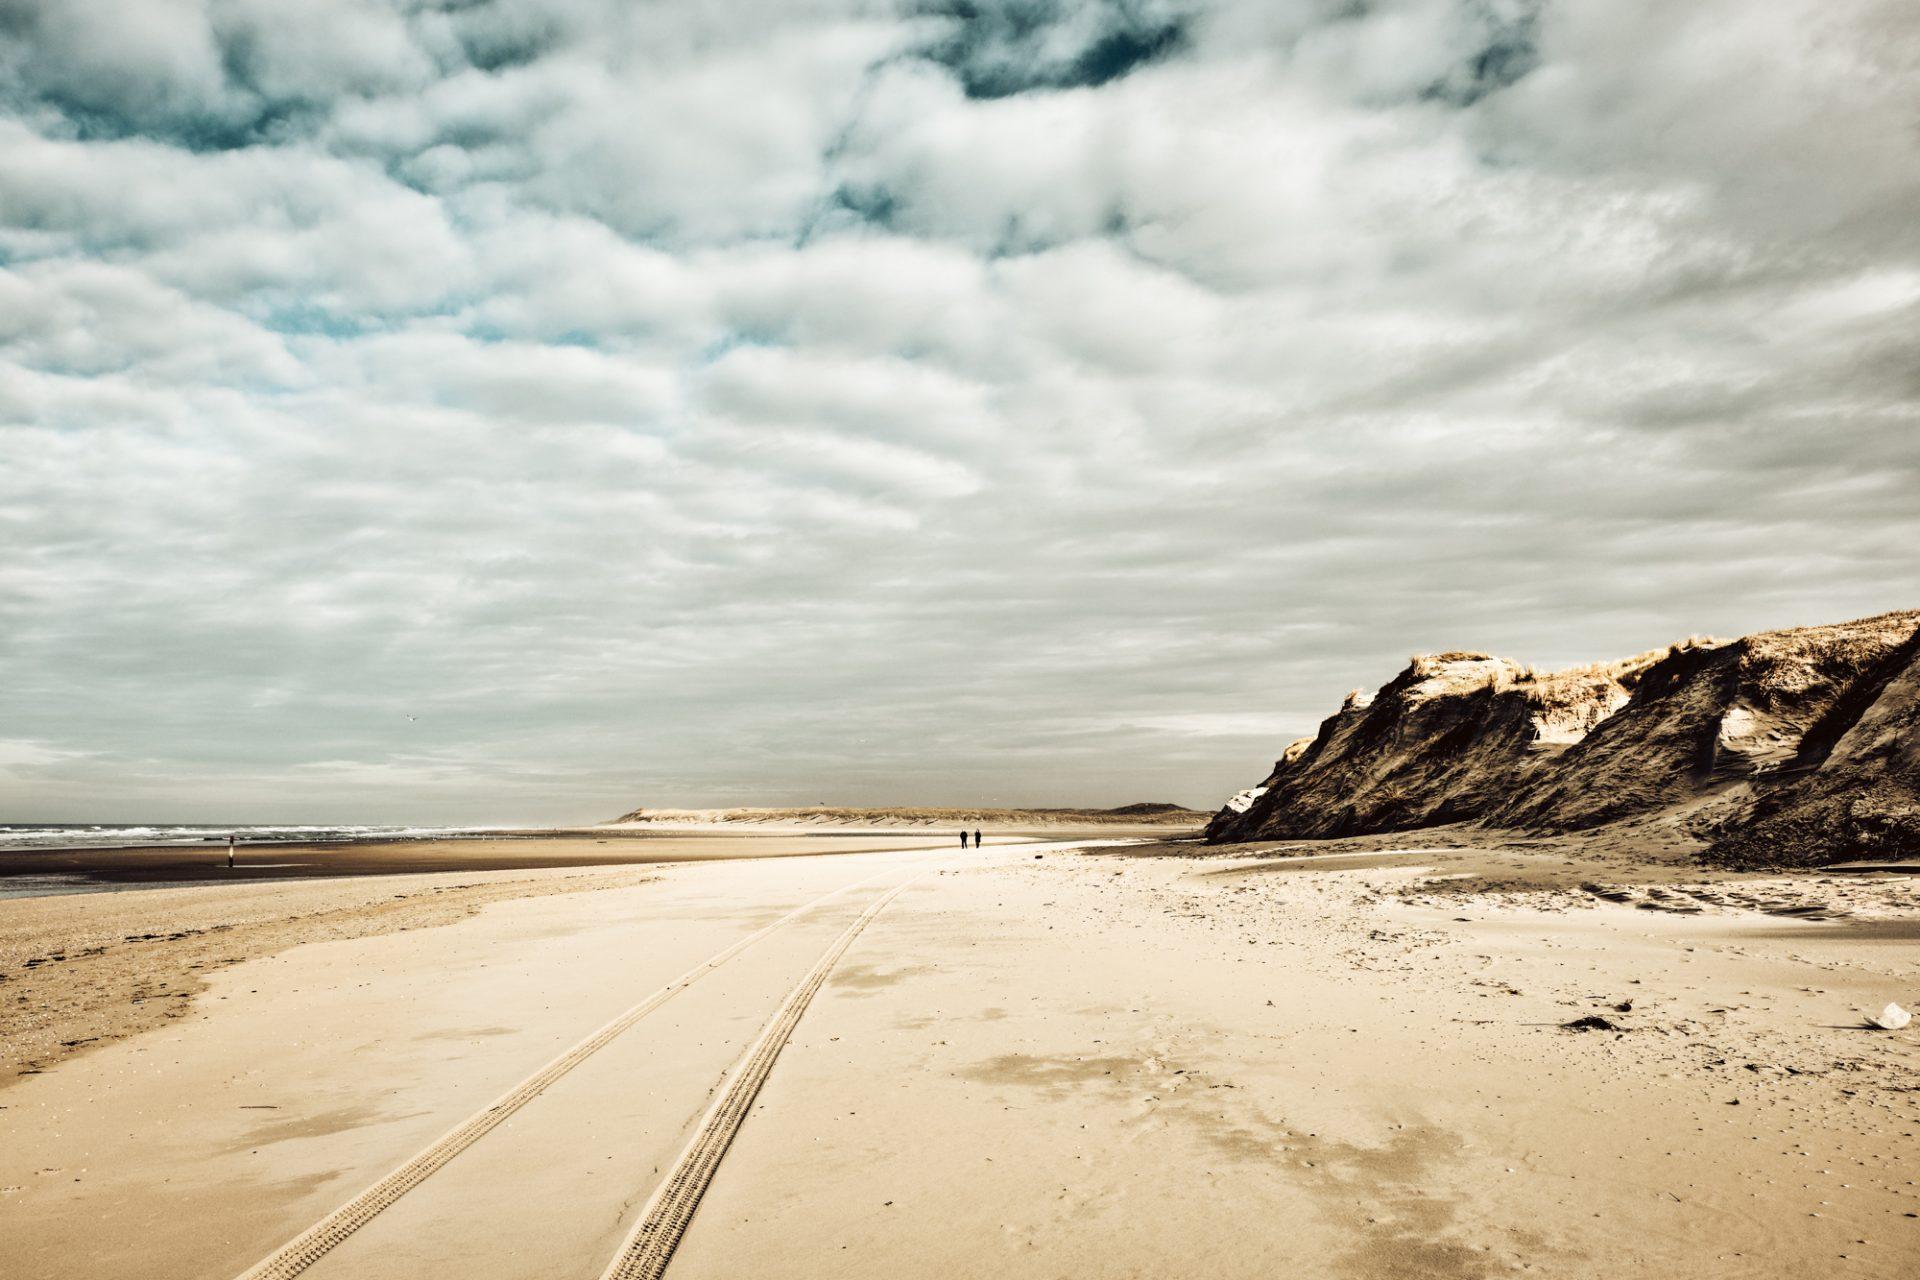 The Dutch Coastline